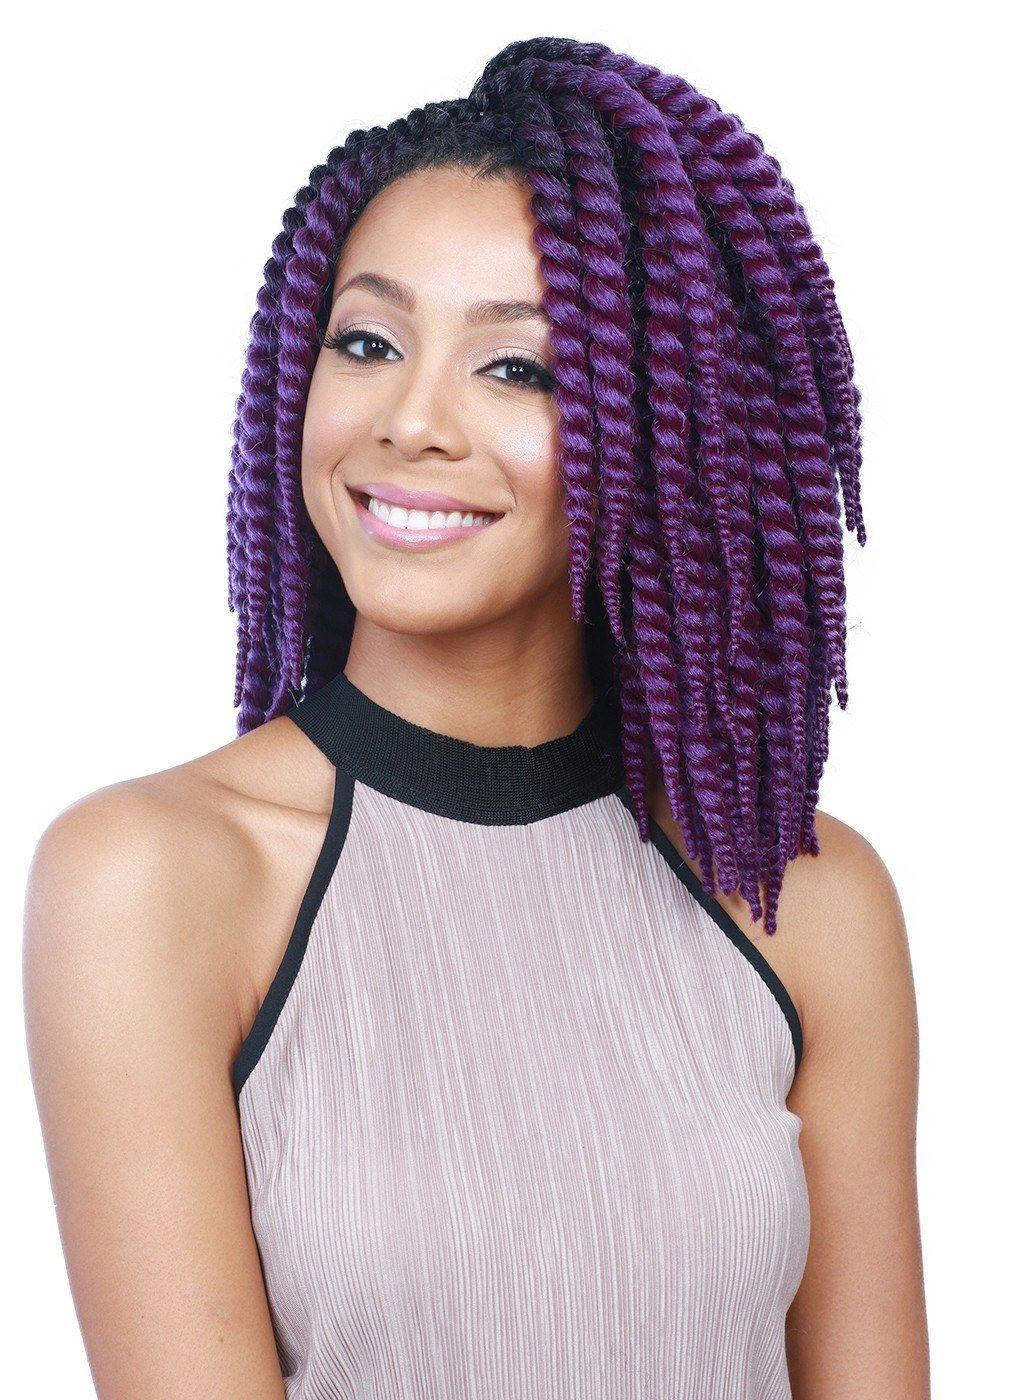 Pin On Pretty Hair Styles